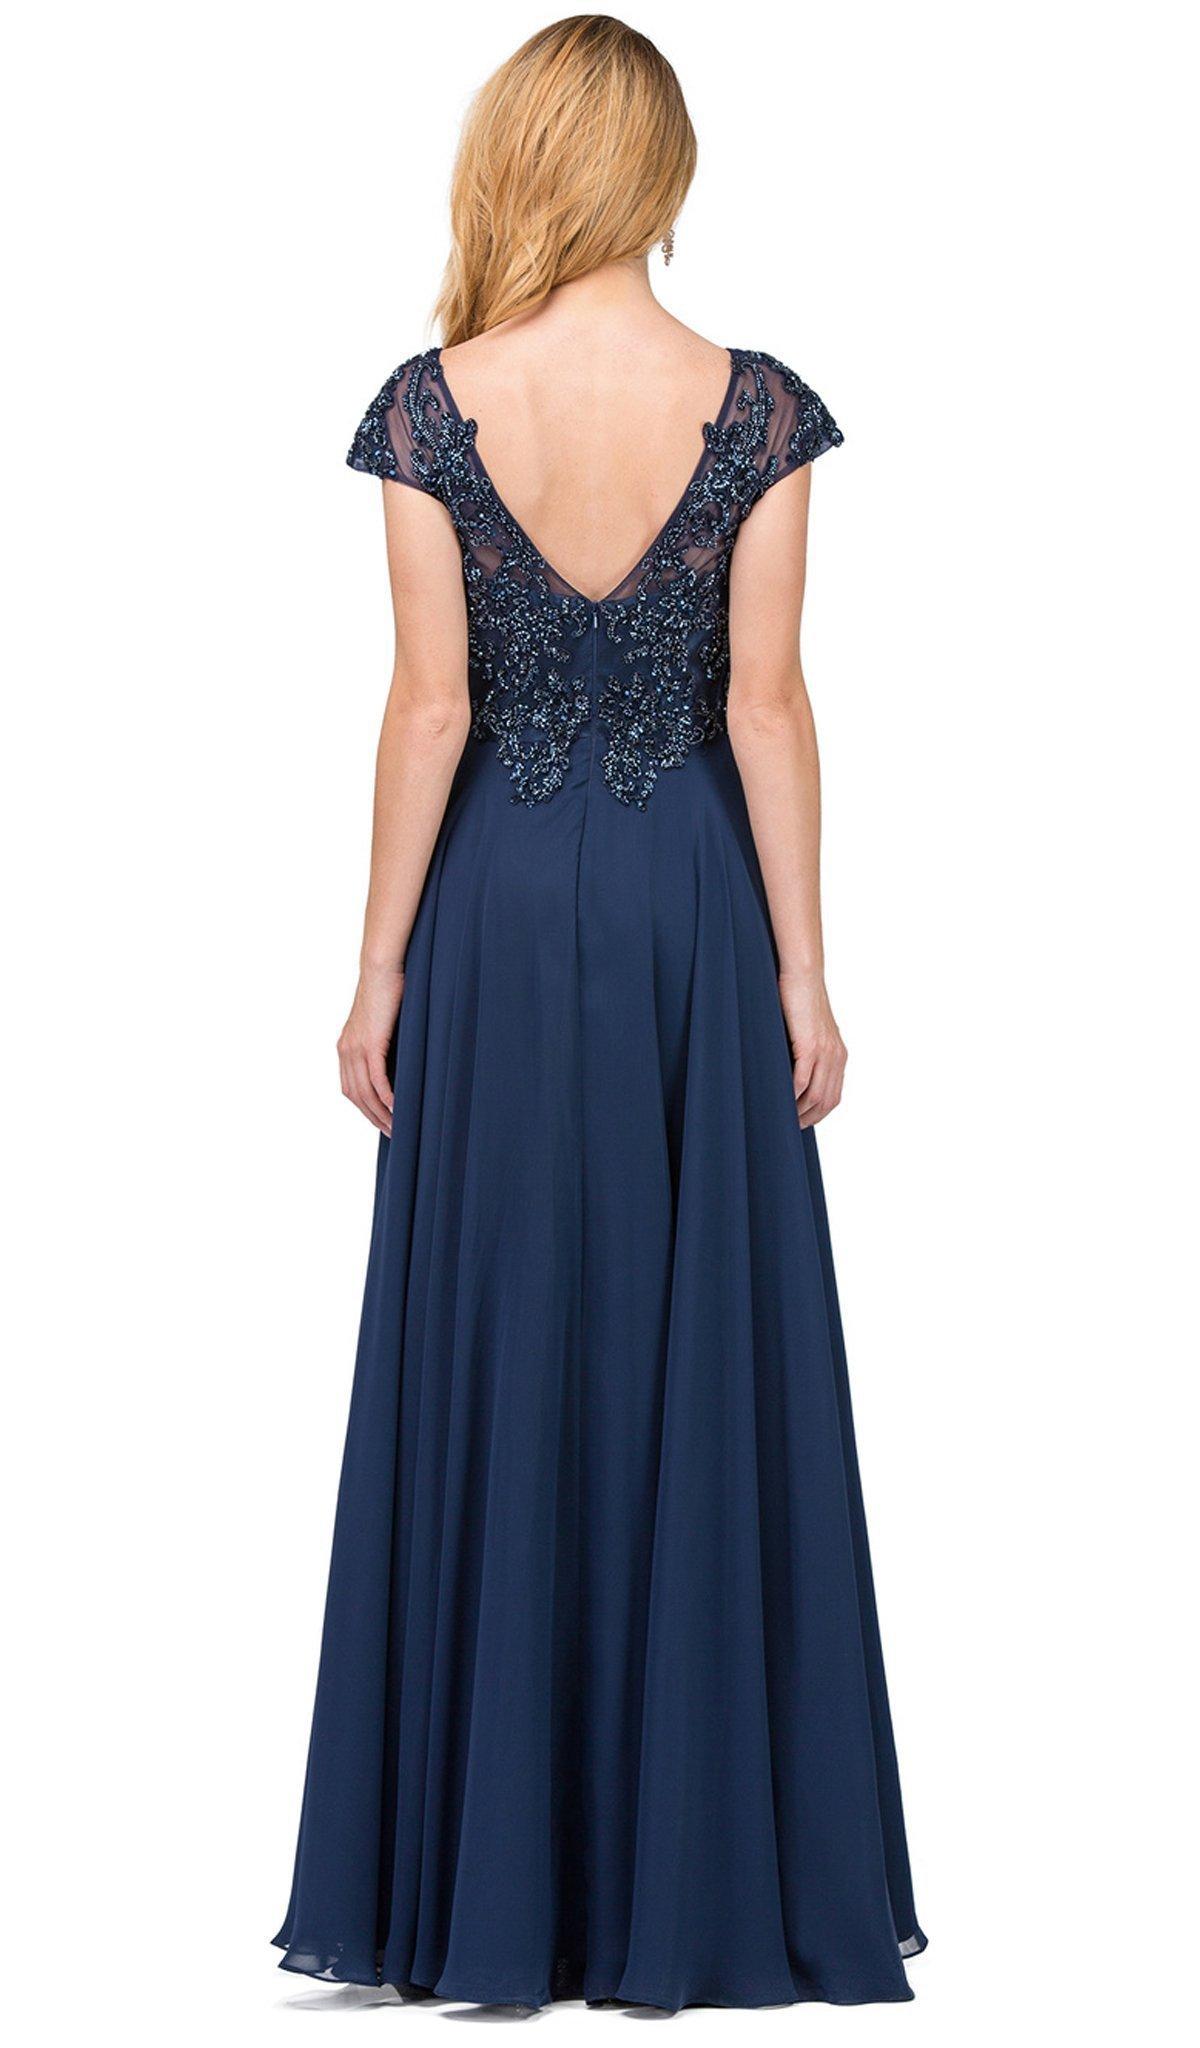 Dancing Queen - 2333 Embellished Cap Sleeve V-neck A-line Prom Dress